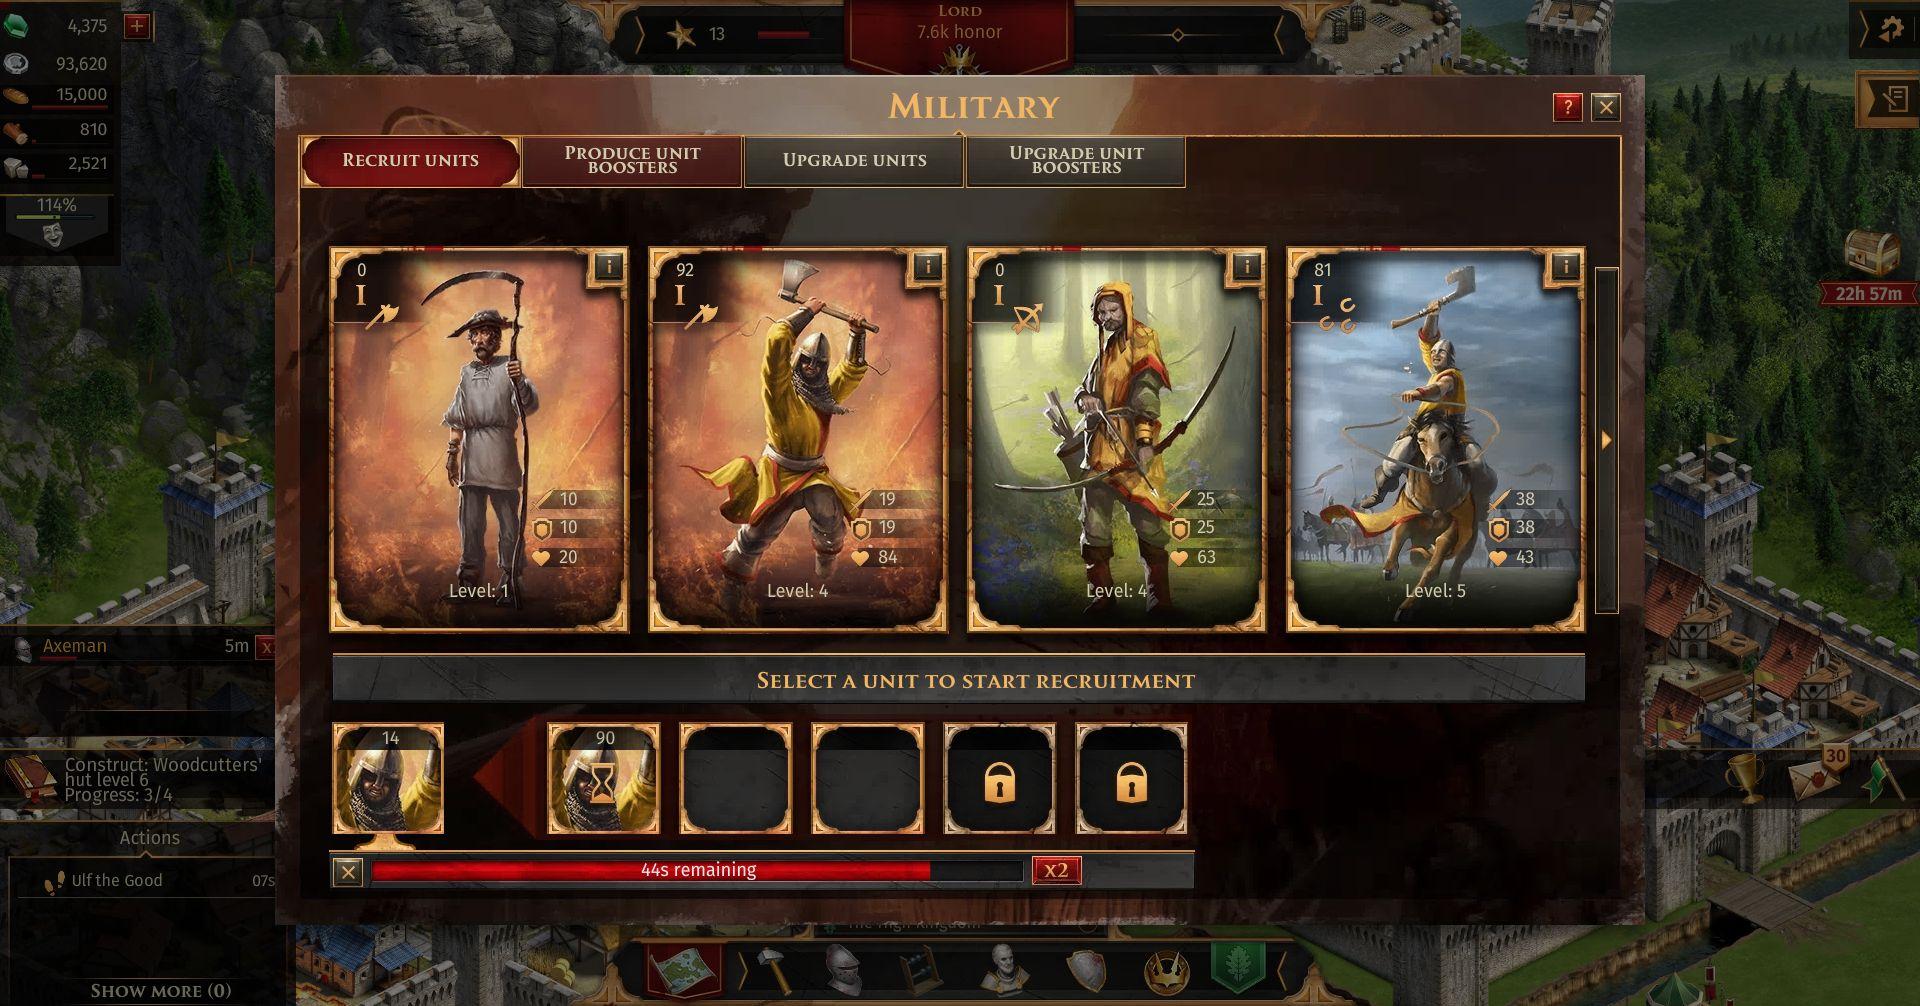 E3 2016 - Legends of Honor Reveals Mobile Plans